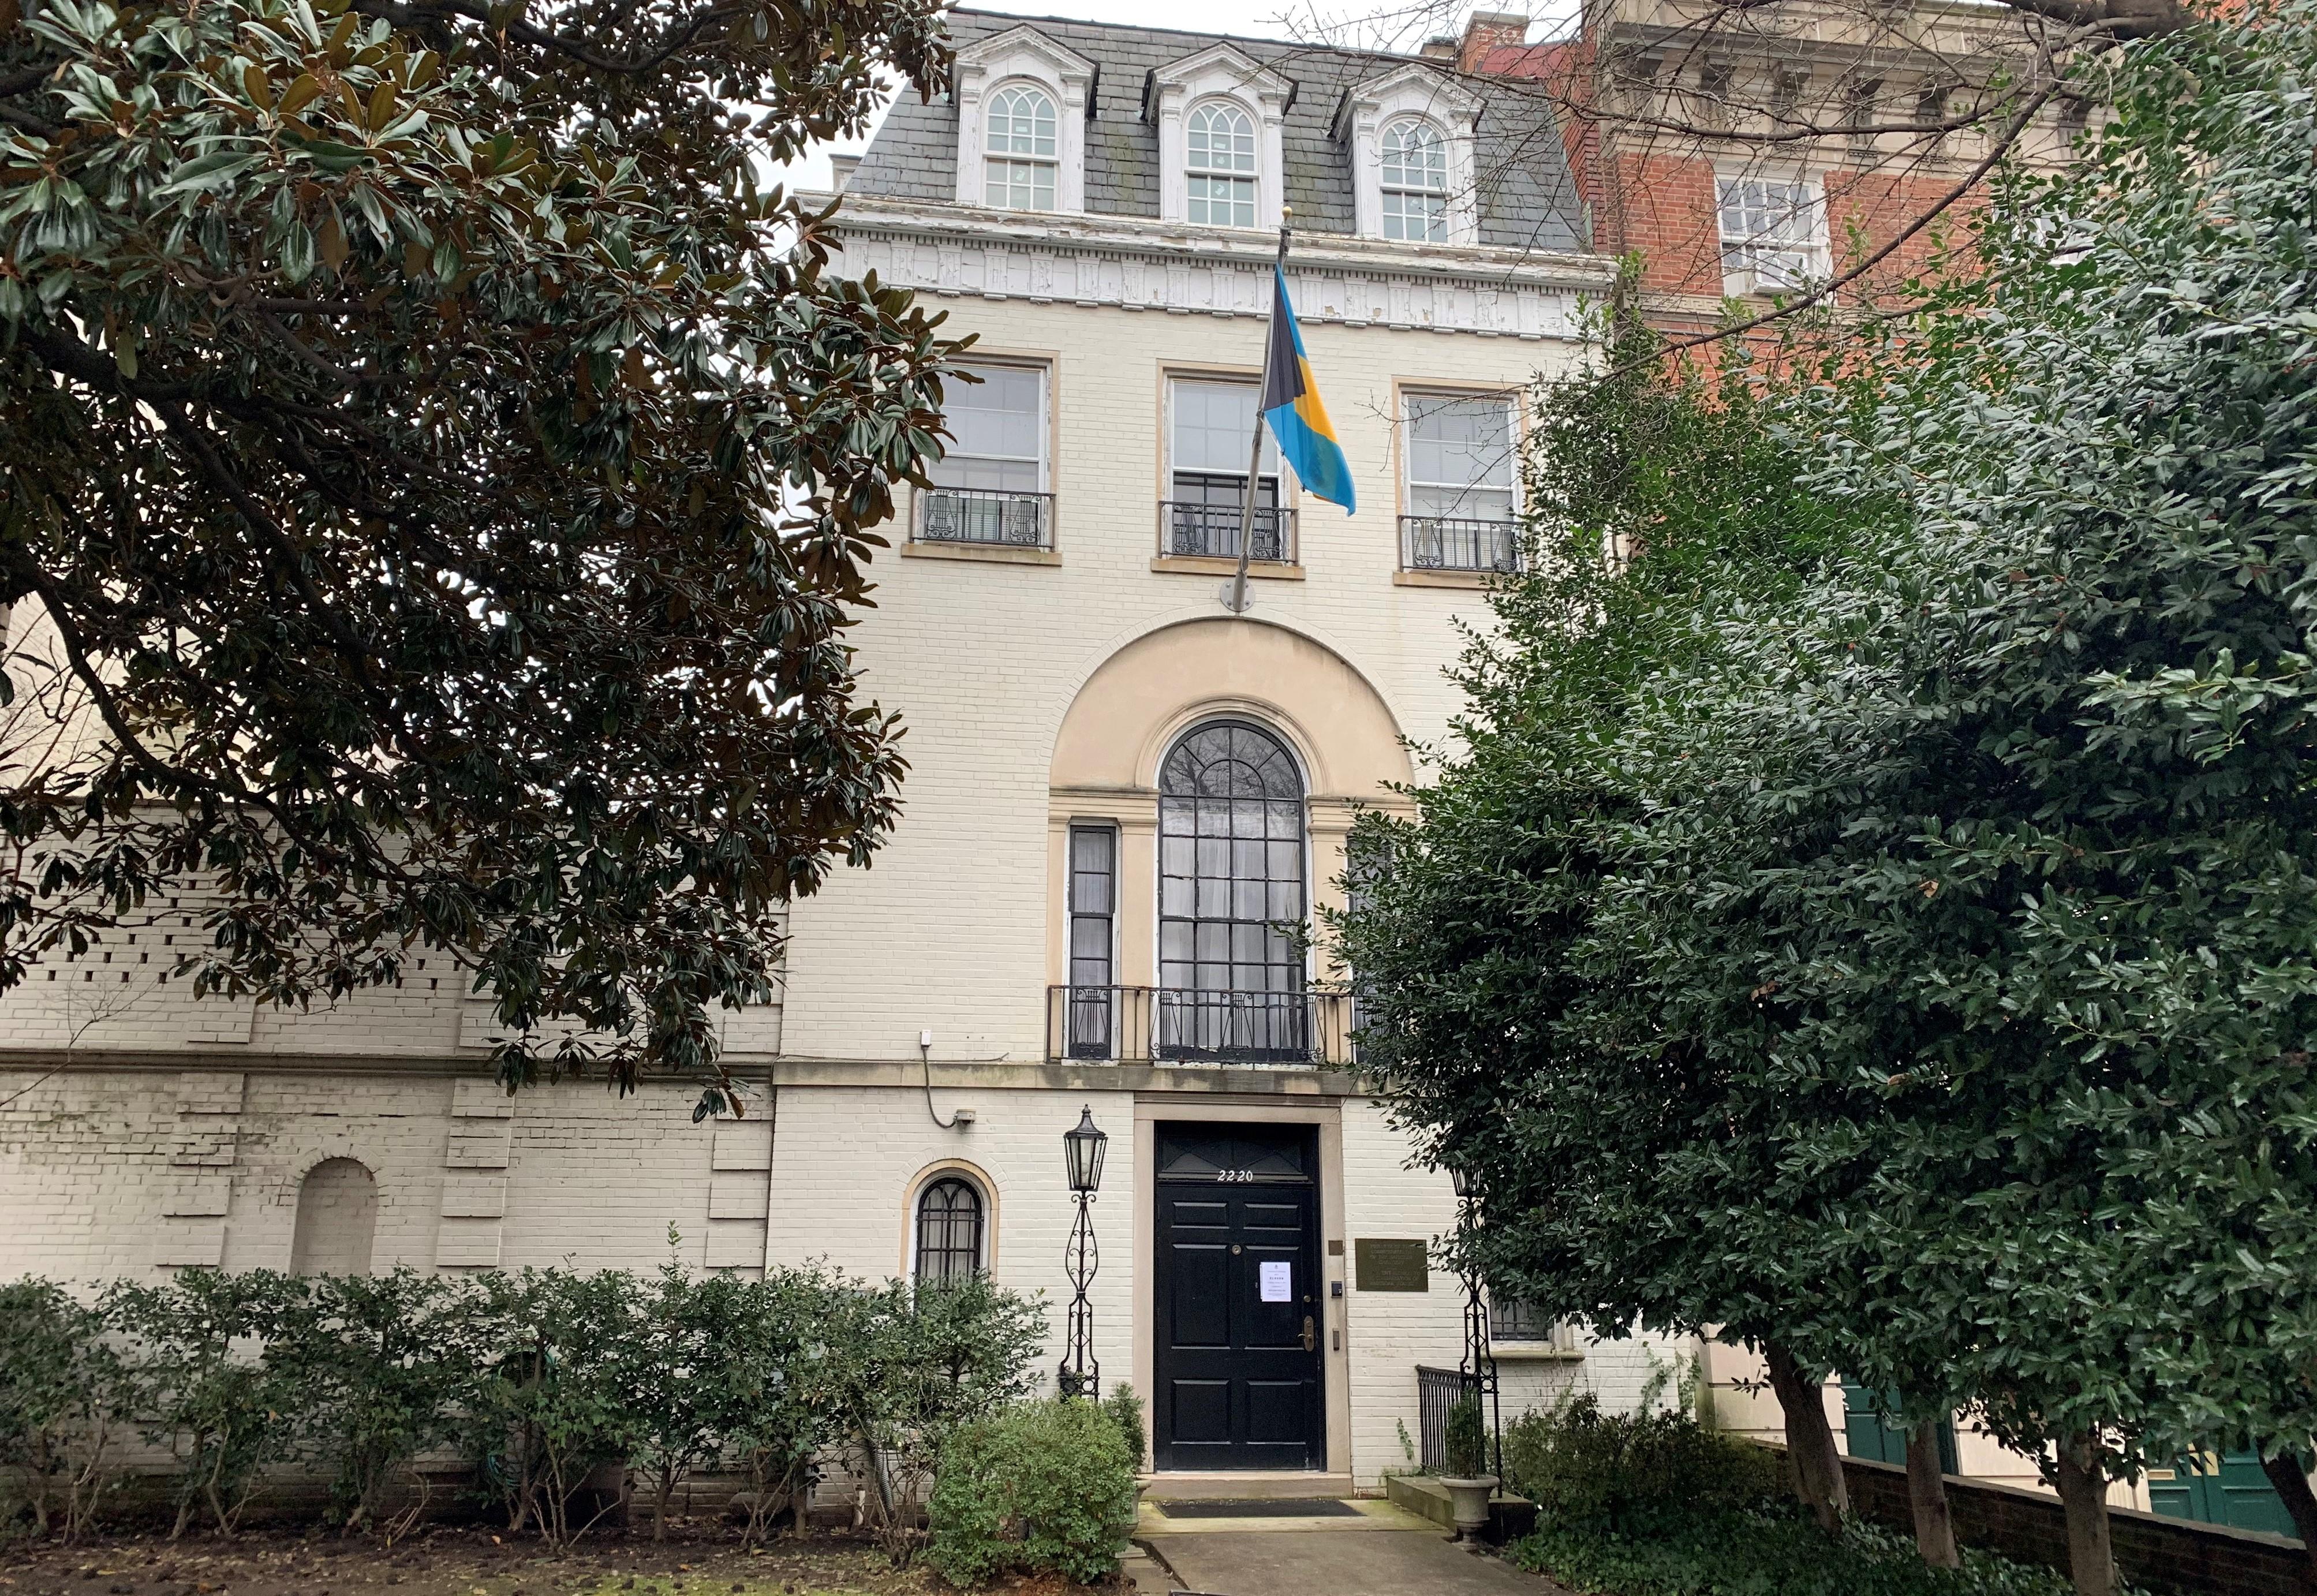 Real Estate and Homes For Sale Near the Embassy of Bahamas in Washington, DC. Artyom Shmatko Realtor